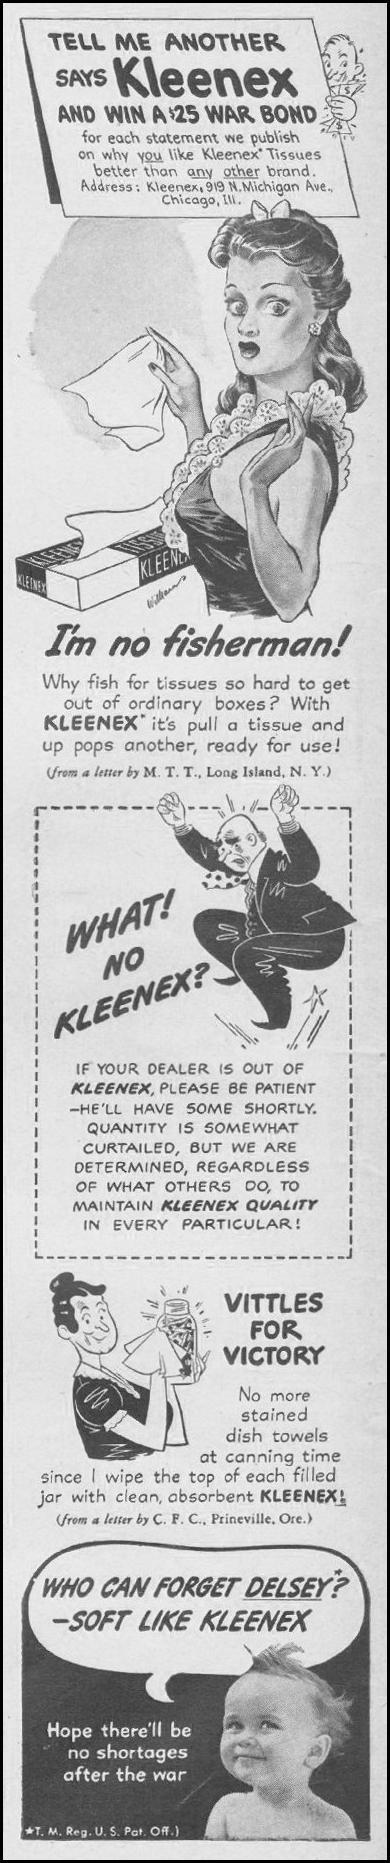 KLEENEX TISSUES LIFE 08/09/1943 p. 4